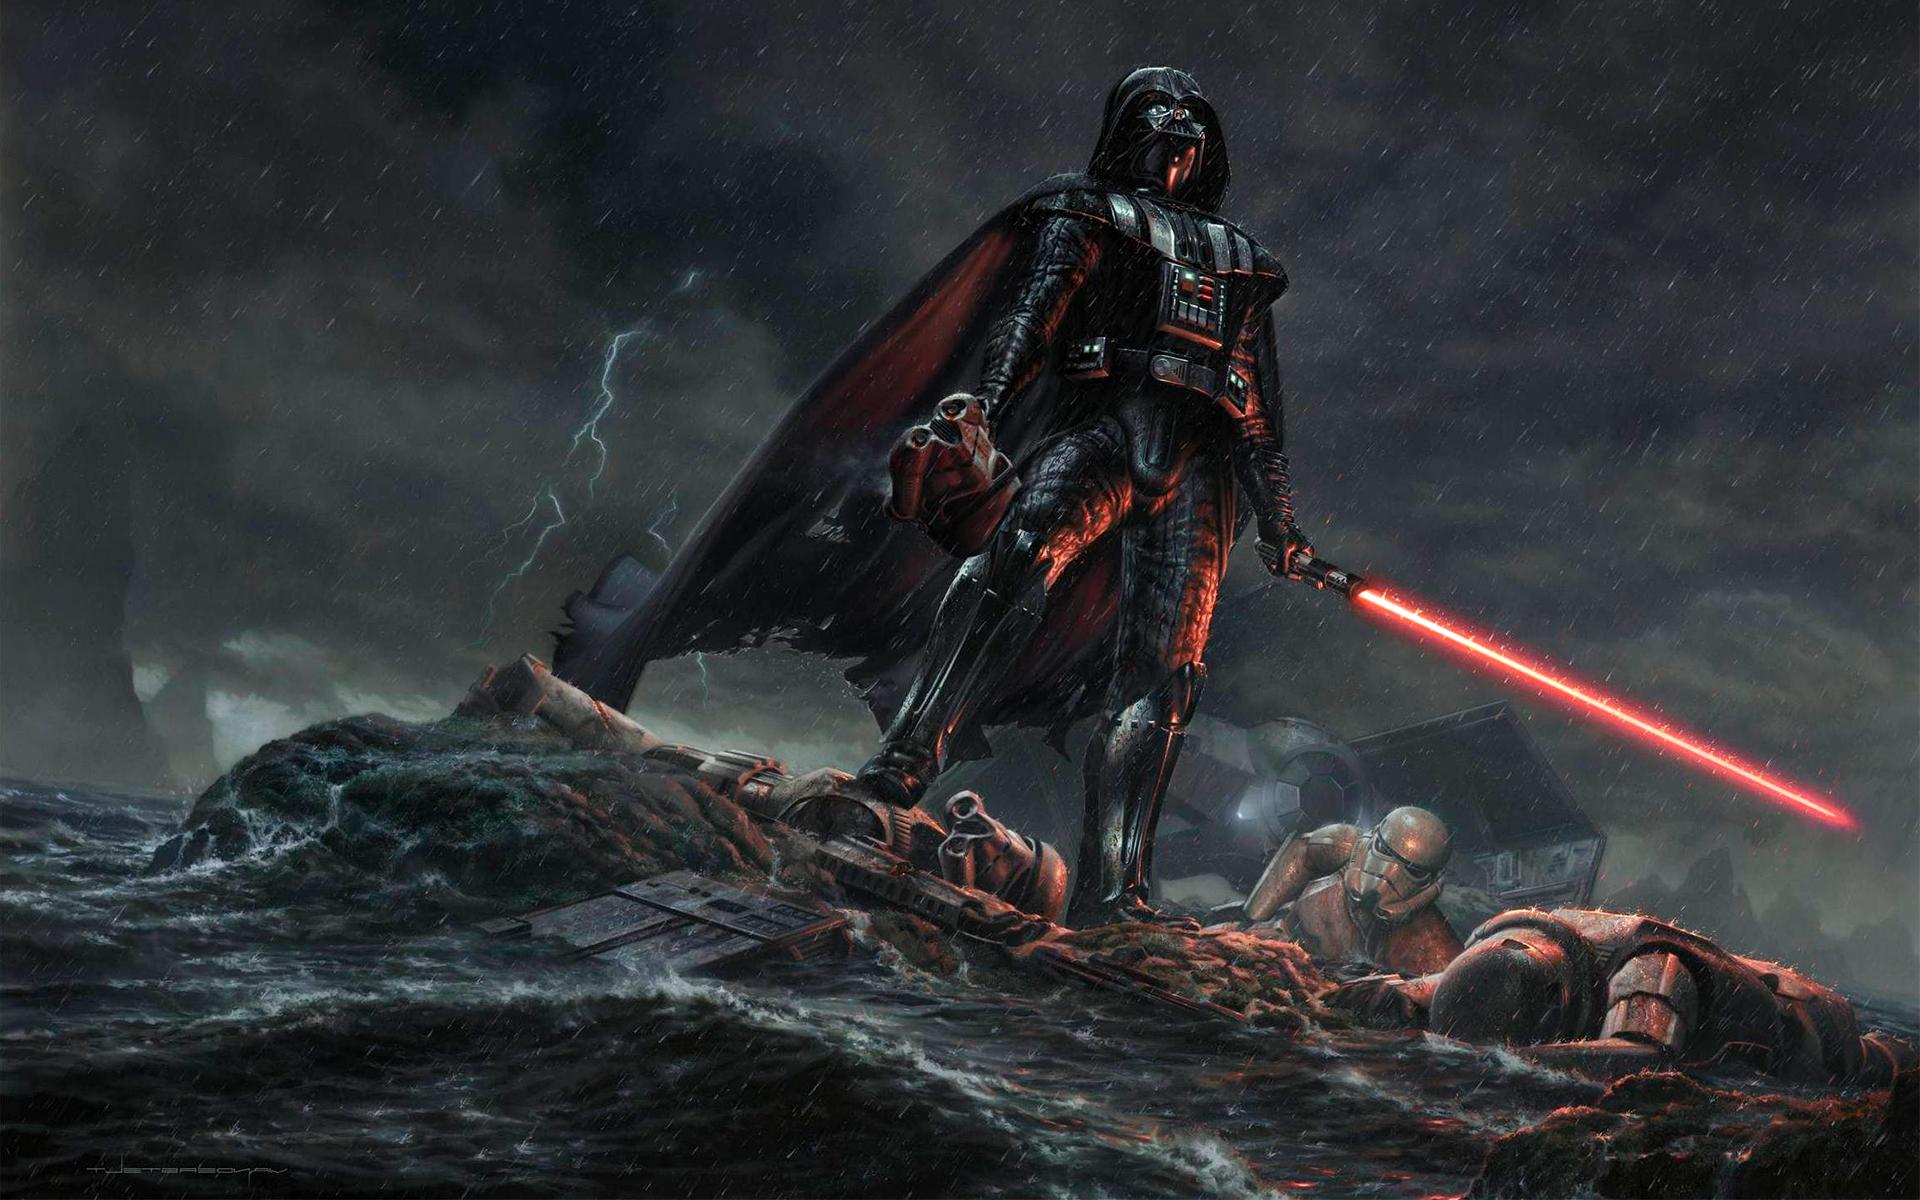 General 1920x1200 Star Wars Darth Vader Storm Troopers TIE Advanced